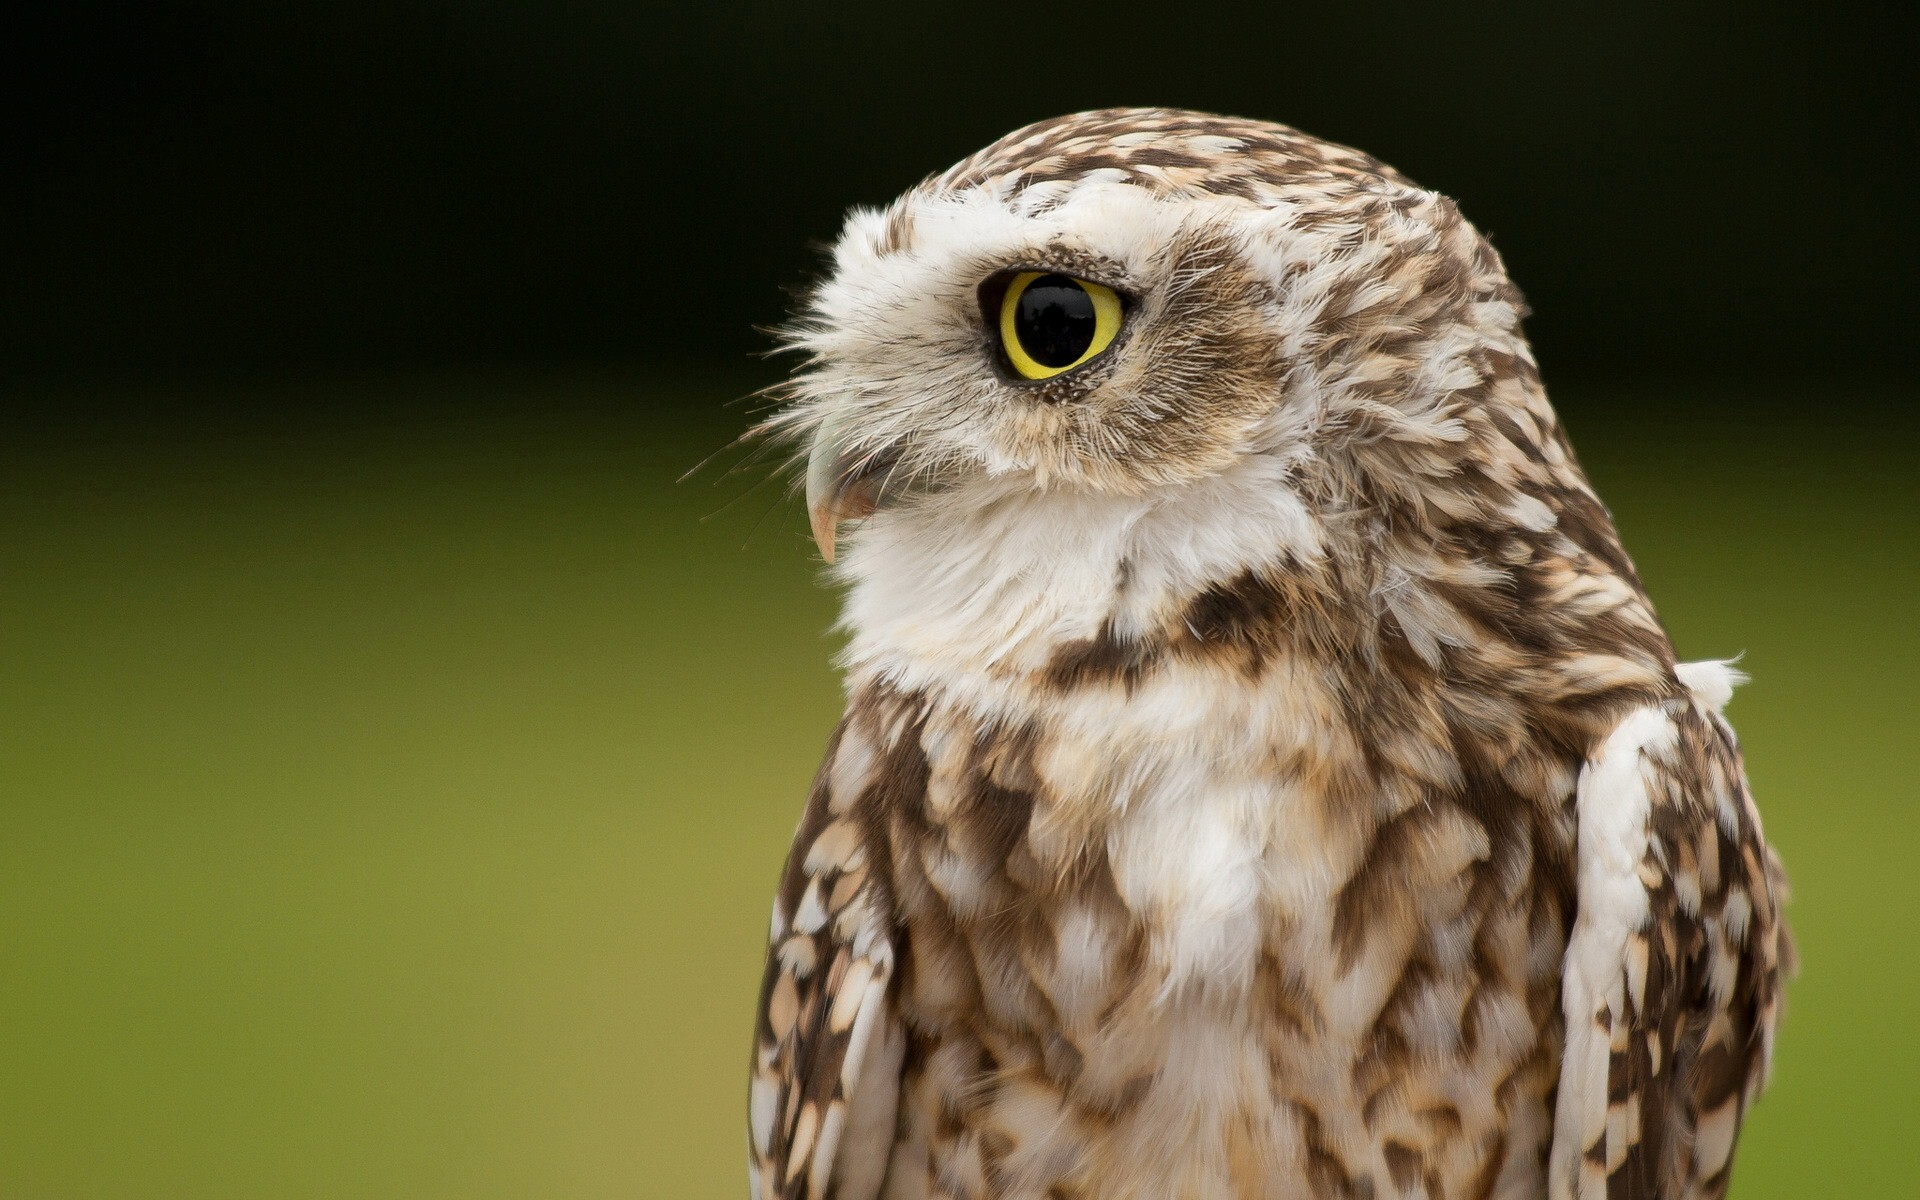 Killing Eye of Owl Bird Photo | HD Wallpapers - photo#16